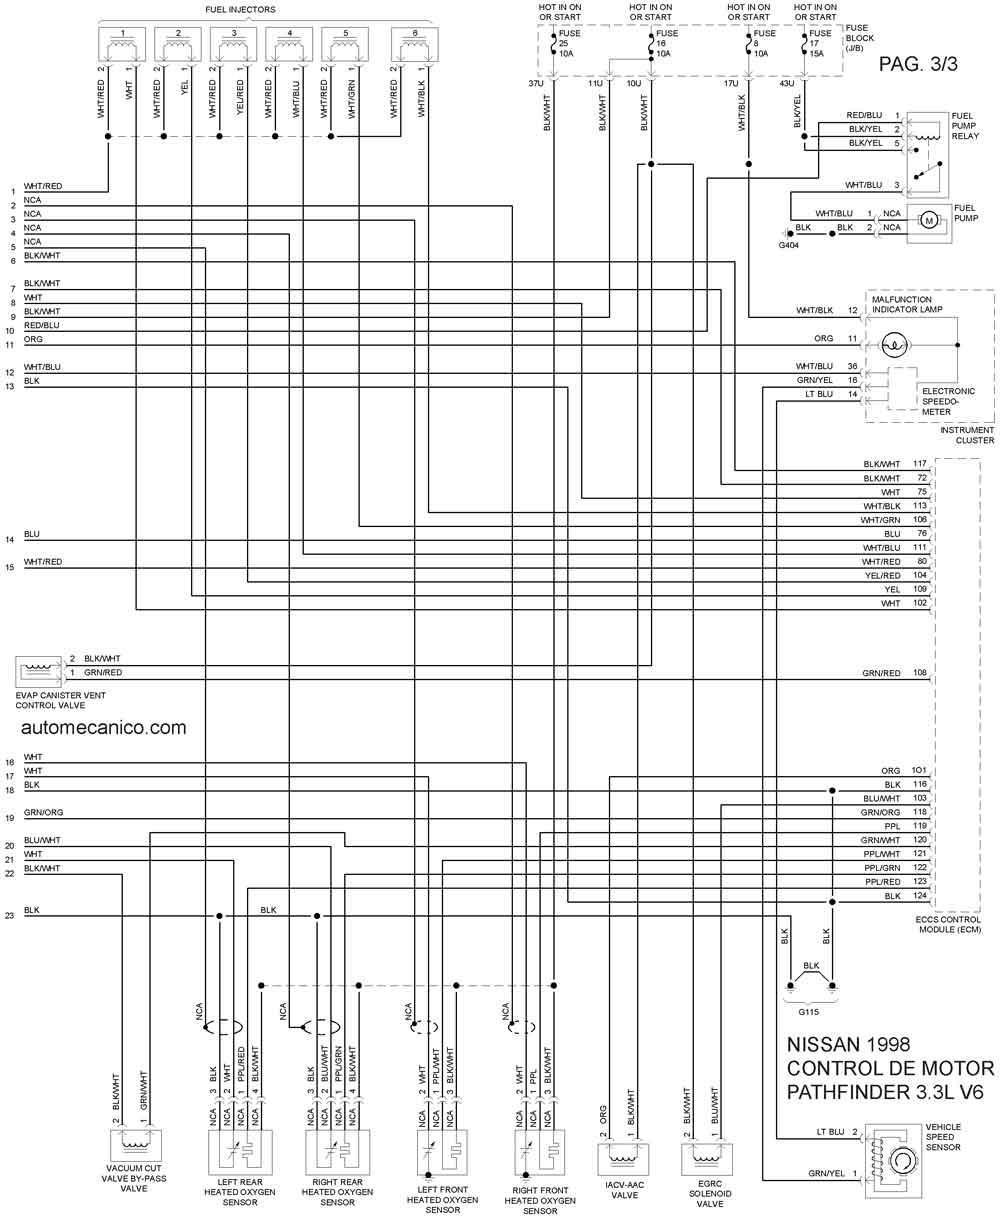 Dongfeng Diagrama del motor